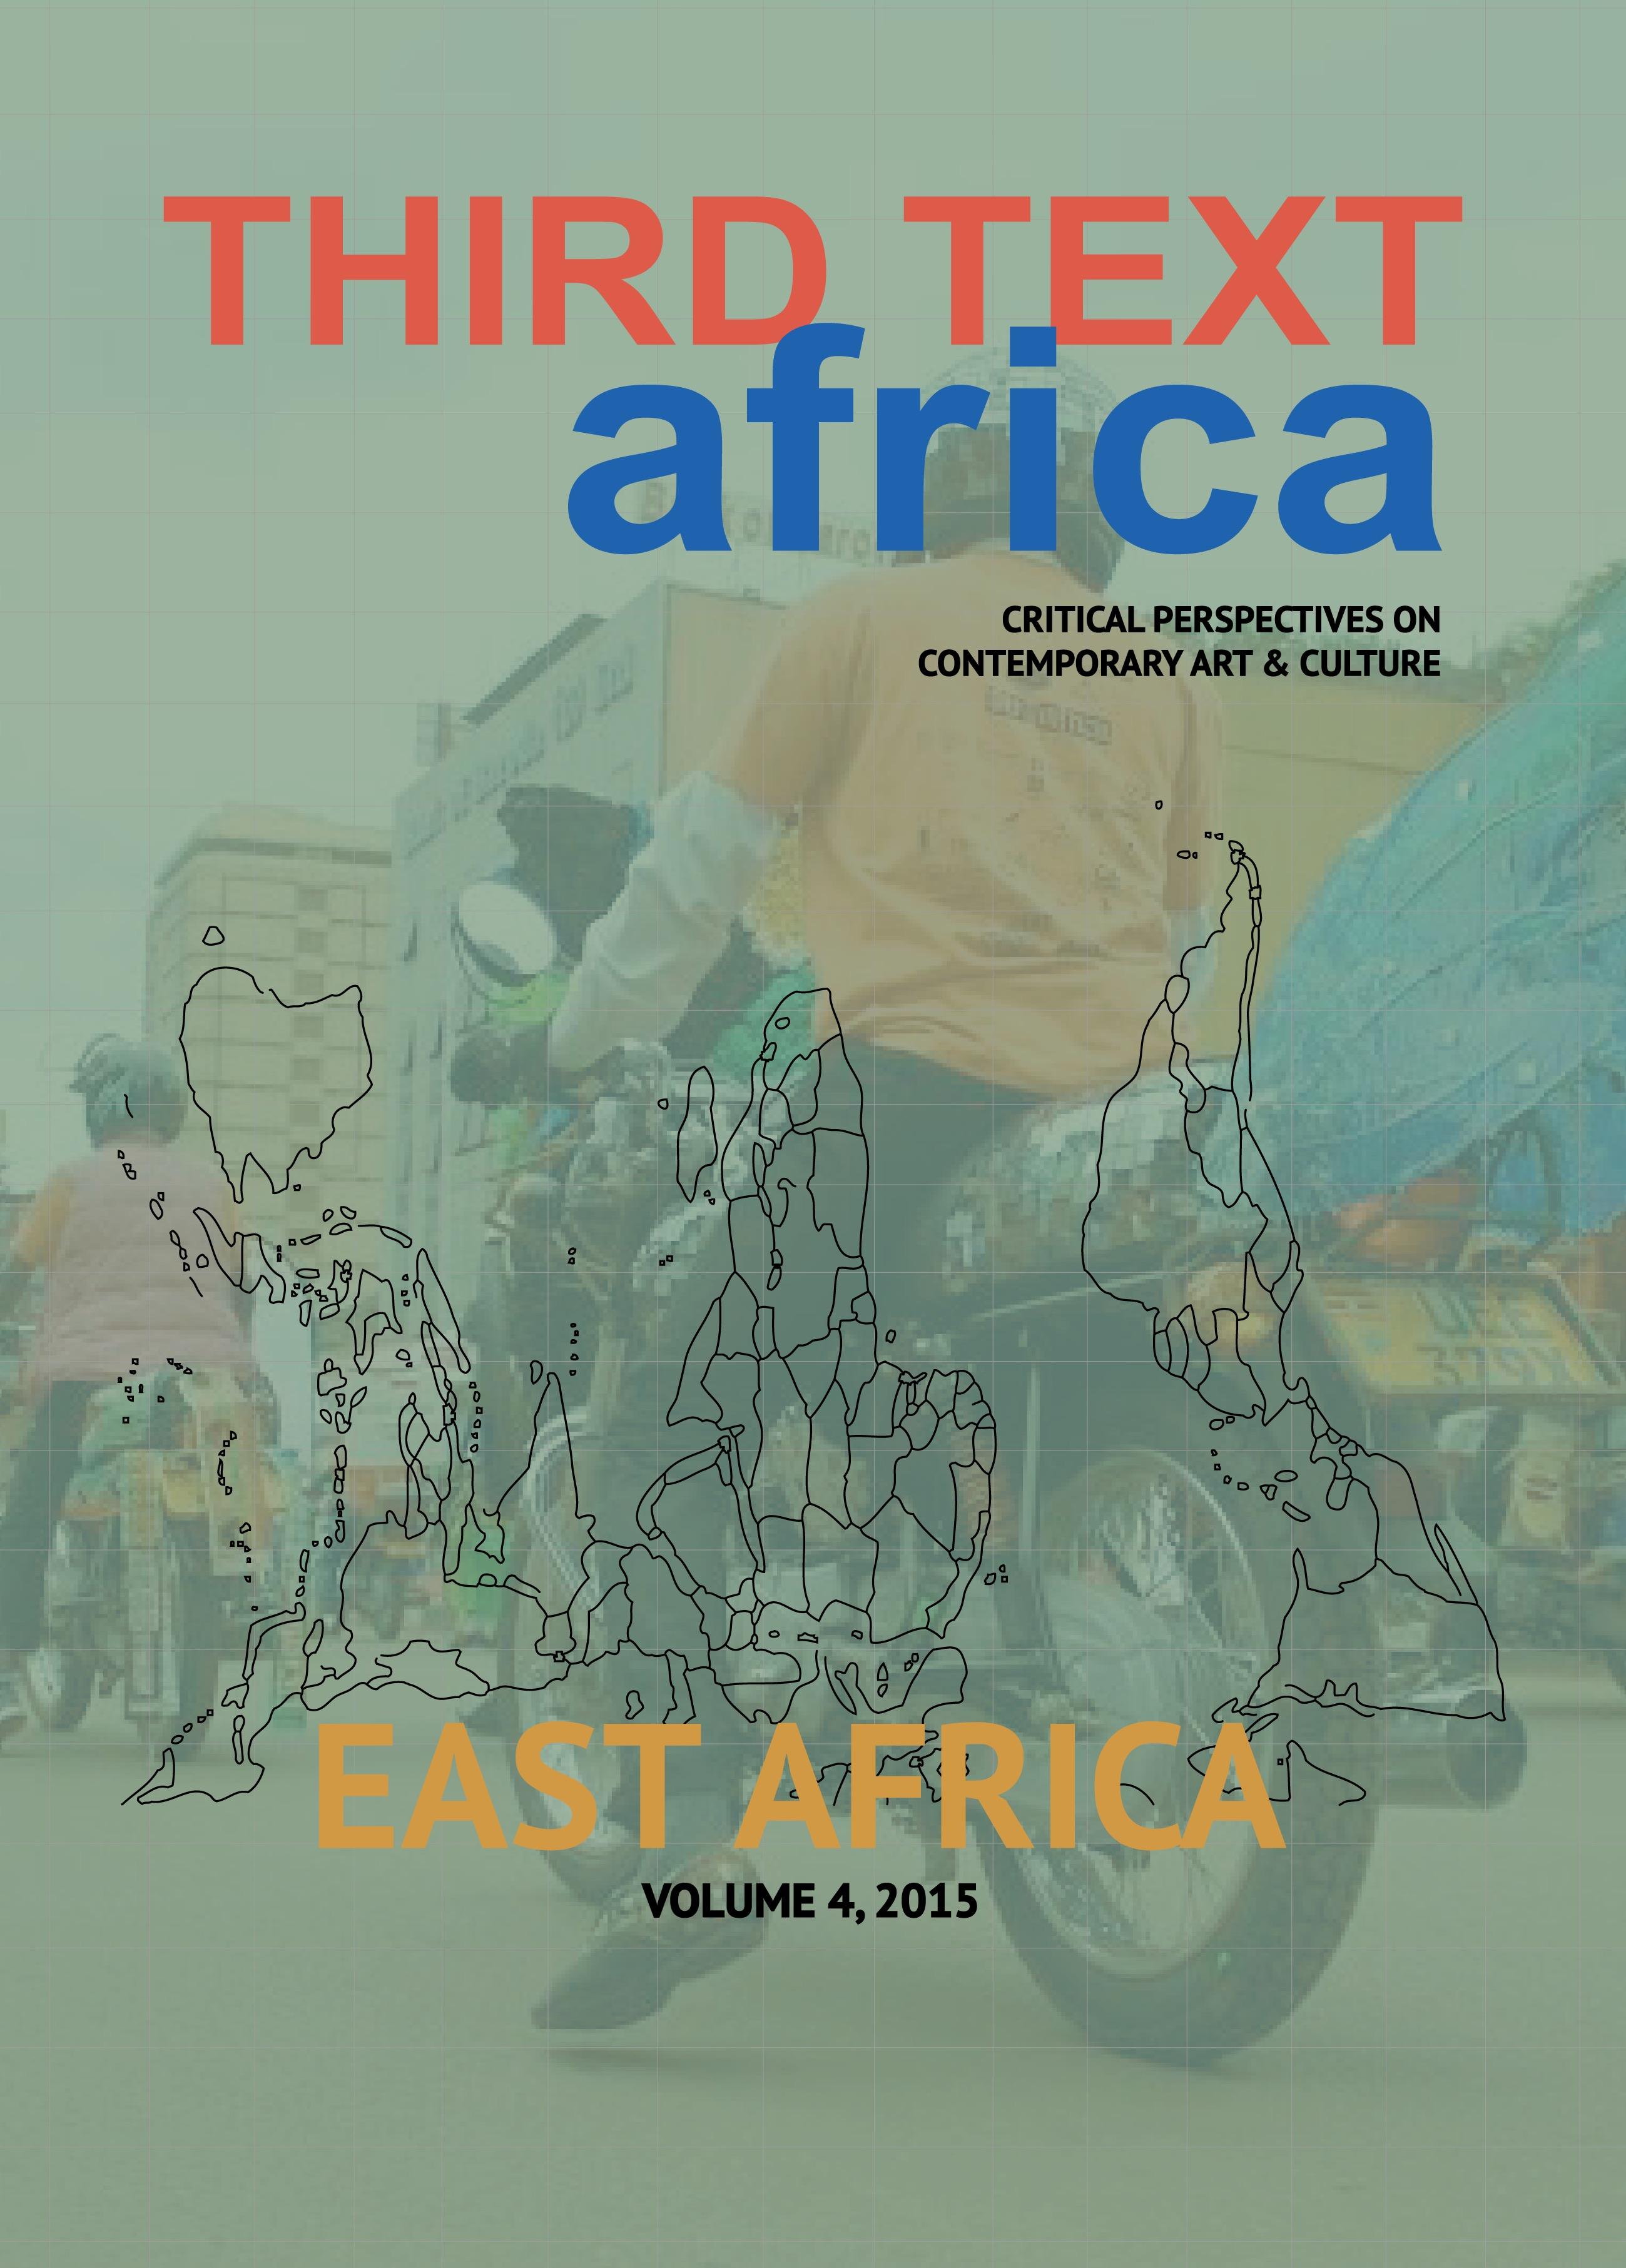 TTA EAST AFRICA-